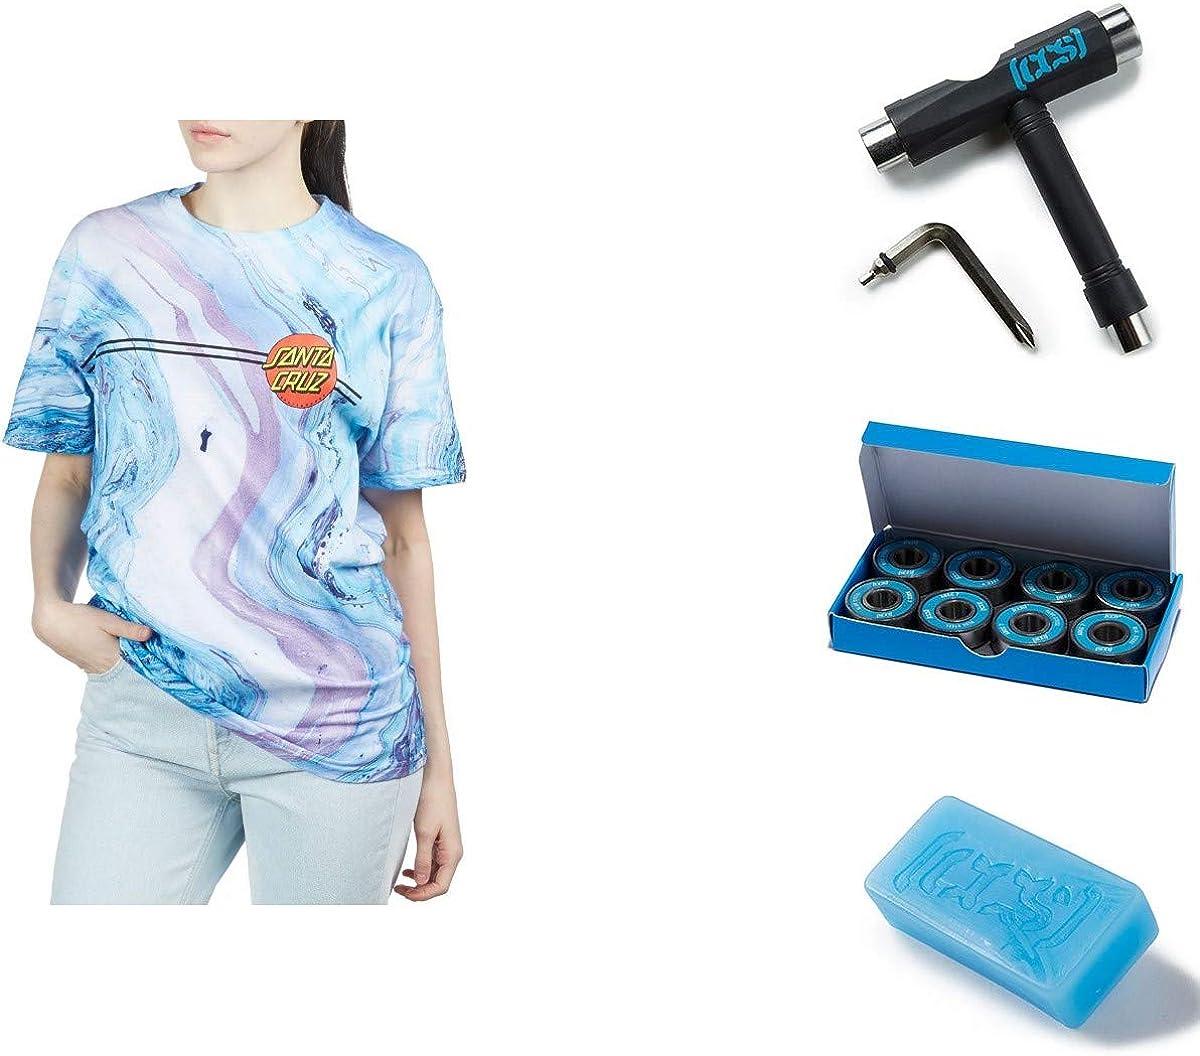 and Wax Santa Cruz Womens Classic Dot Boyfriend Shirts,Large,Marble Tie Dye Bearings LG with CCS Skate Tool